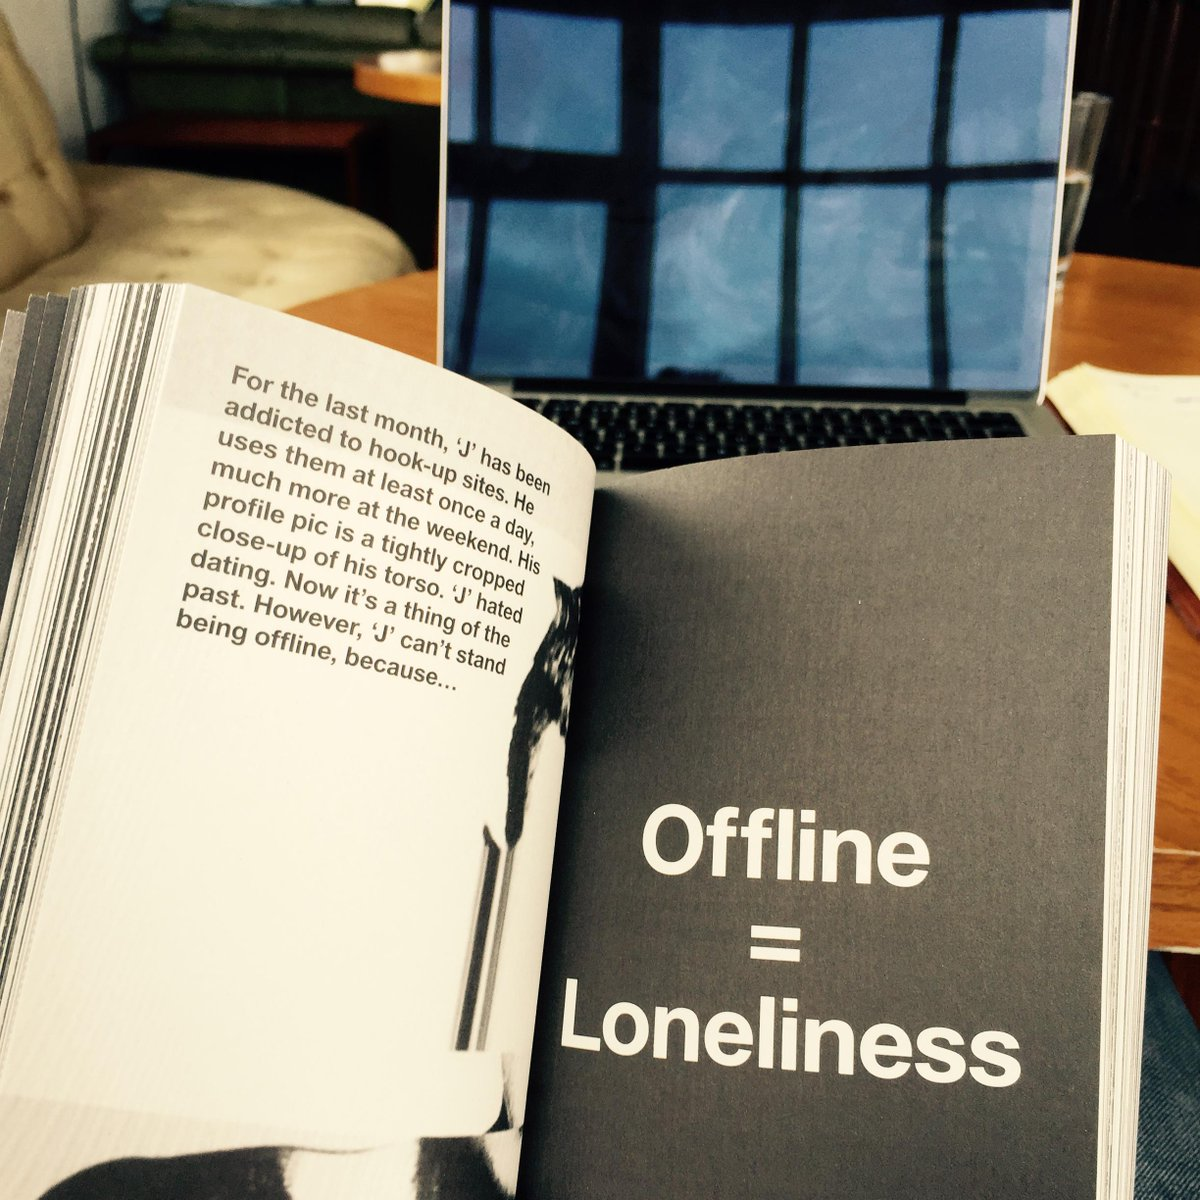 offline dating Samuel Abrahams